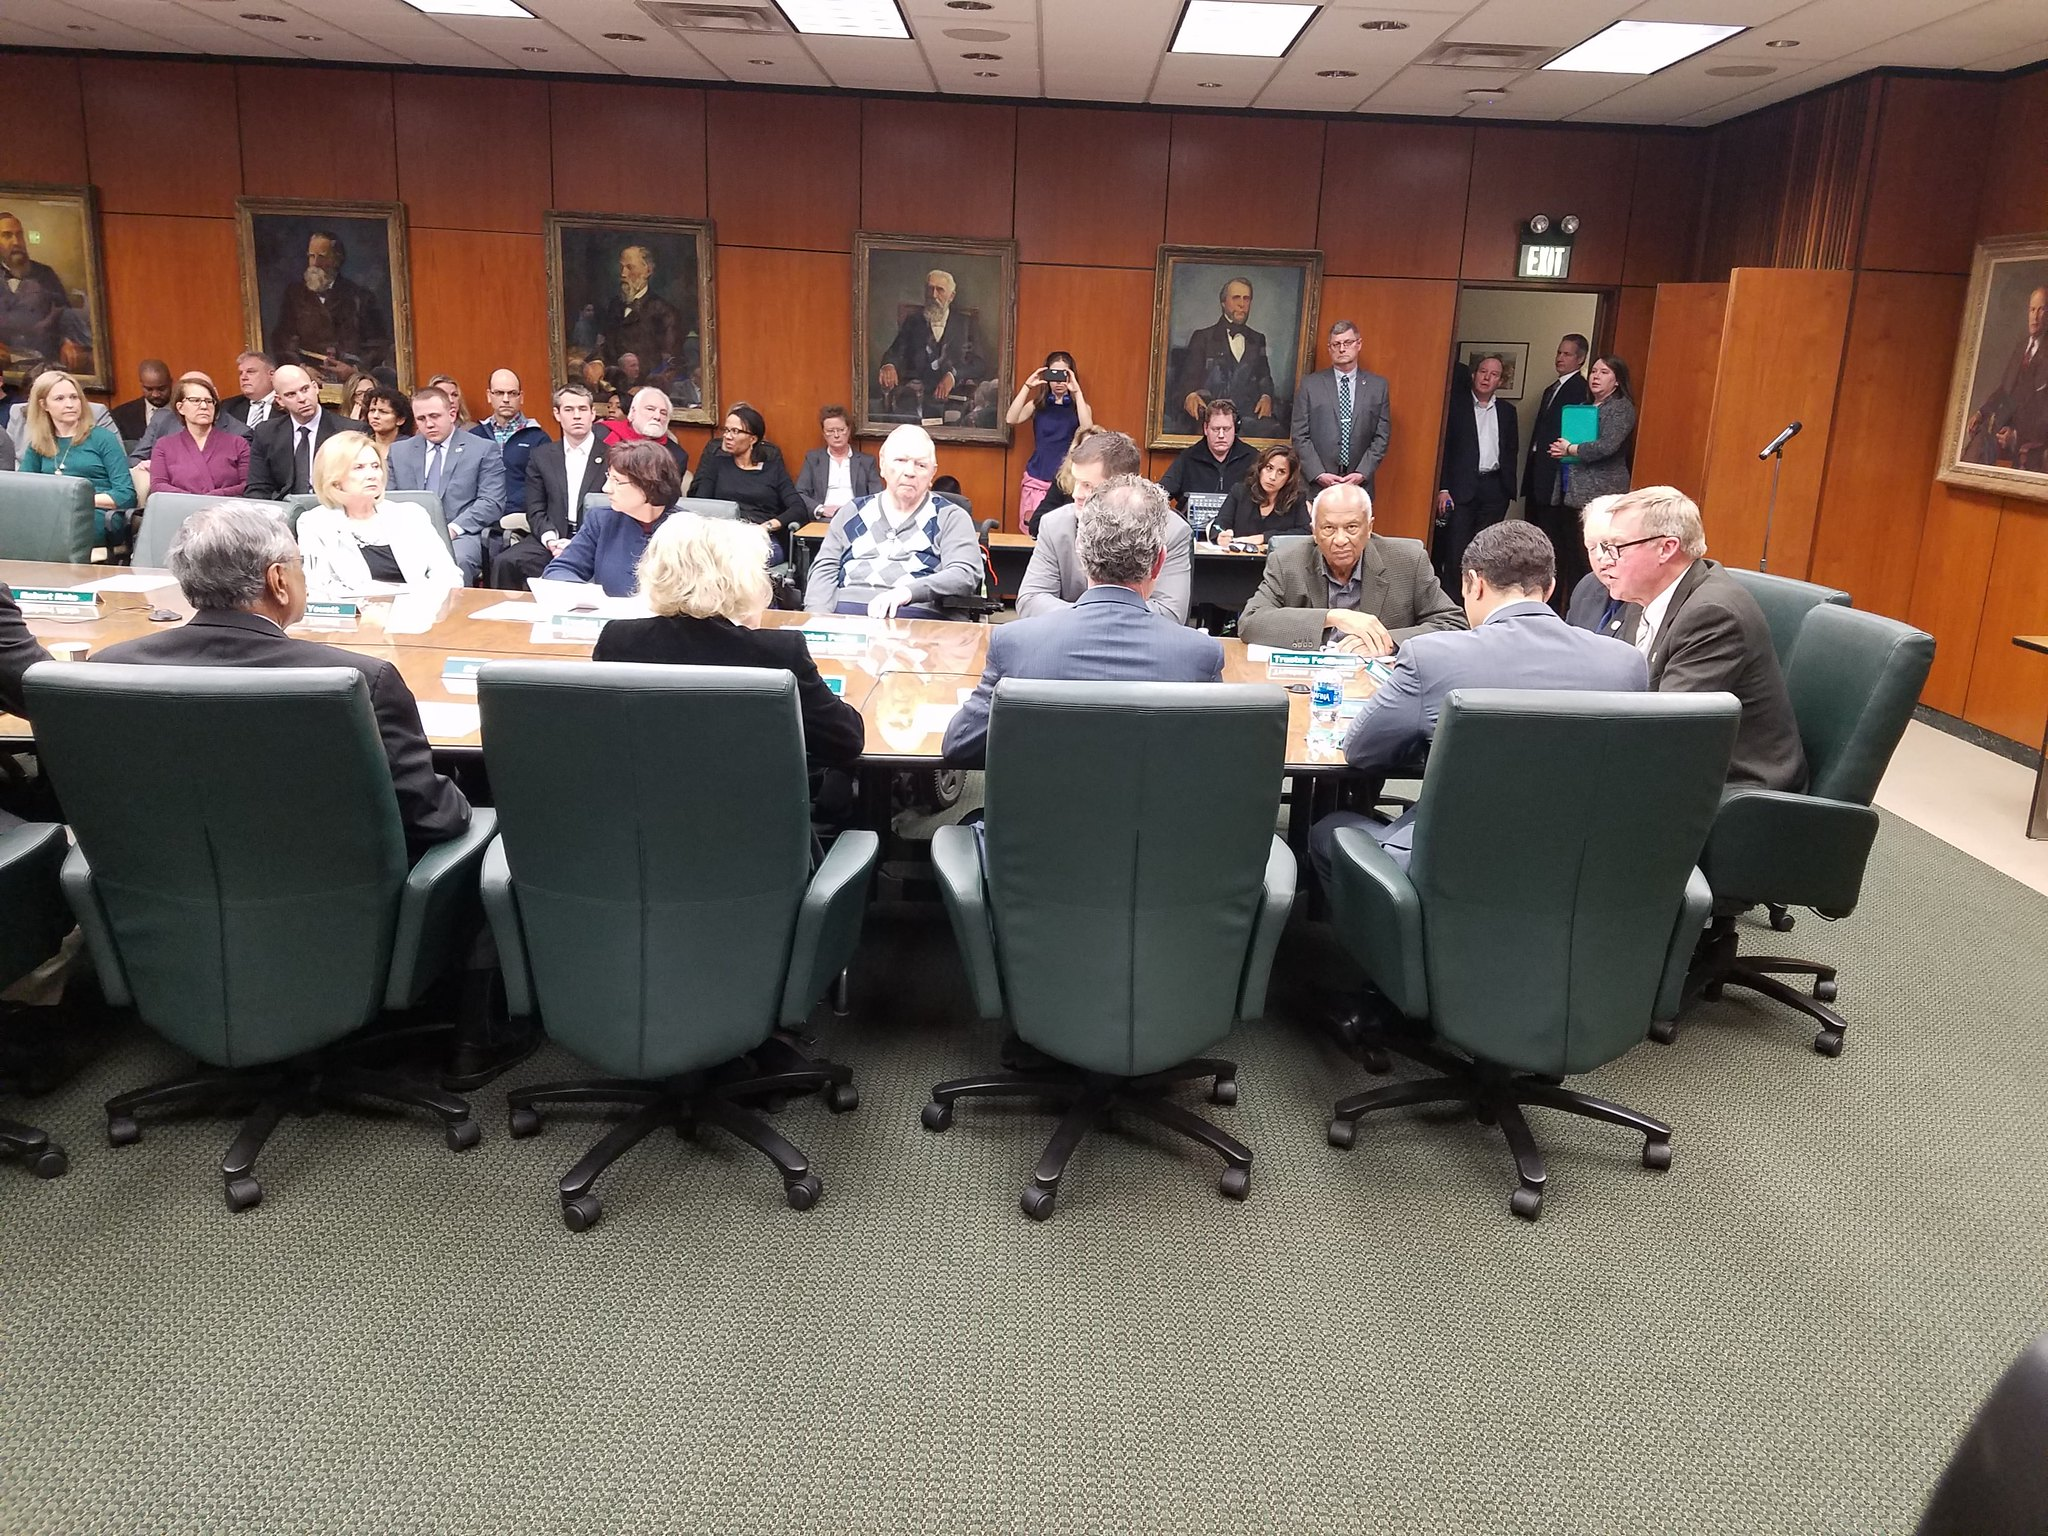 MSU Trustees Name Bill Beekman as Interim President